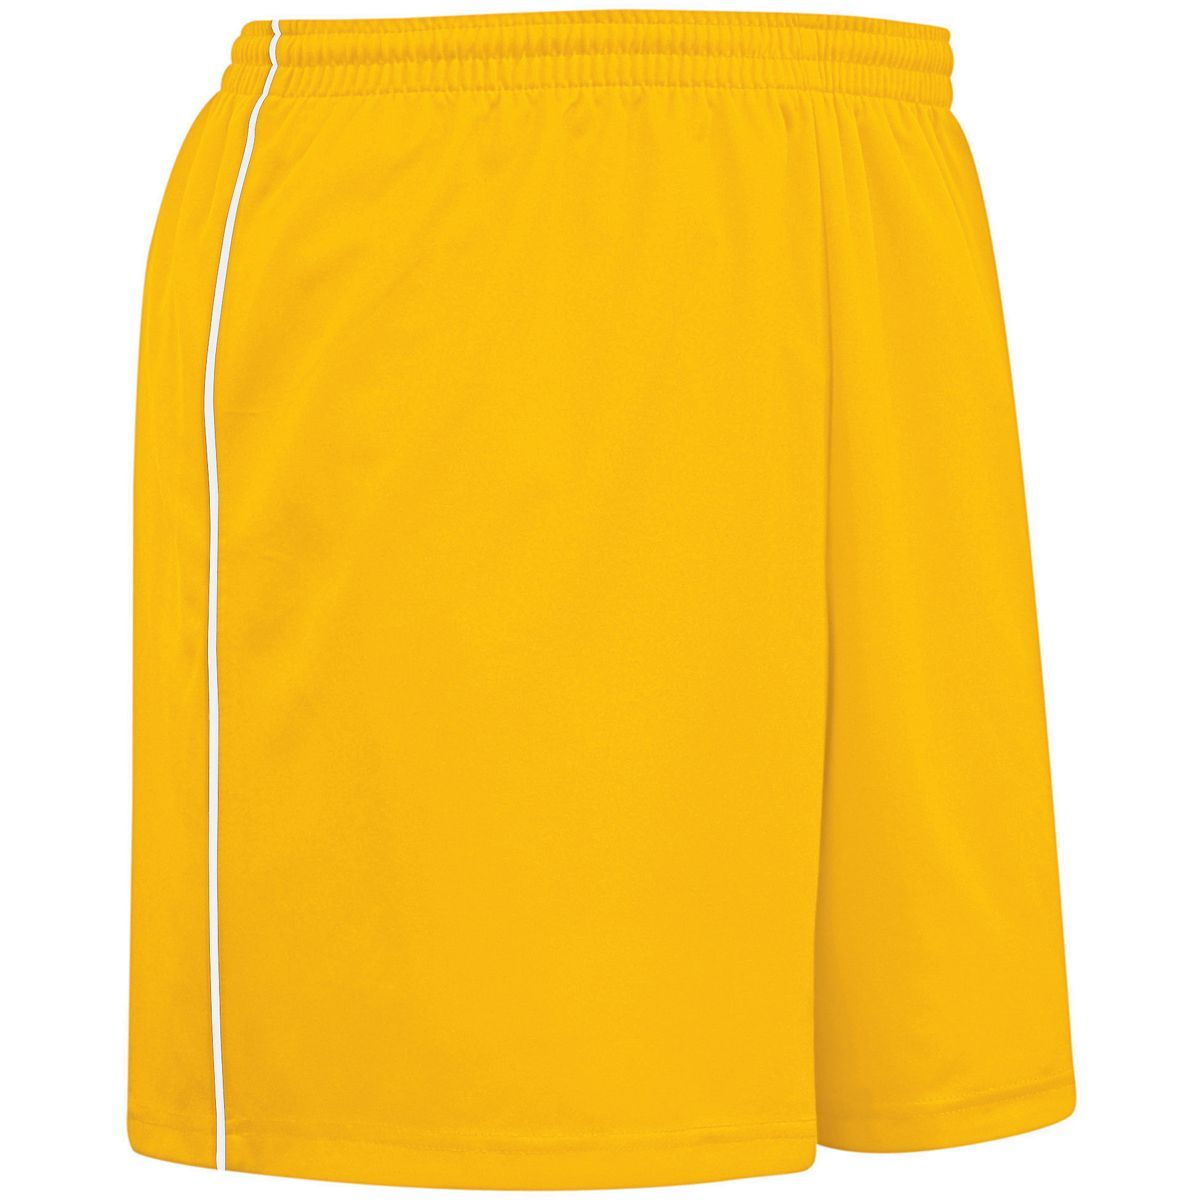 Ladies Flex Shorts - ATHLETIC GOLD/WHITE